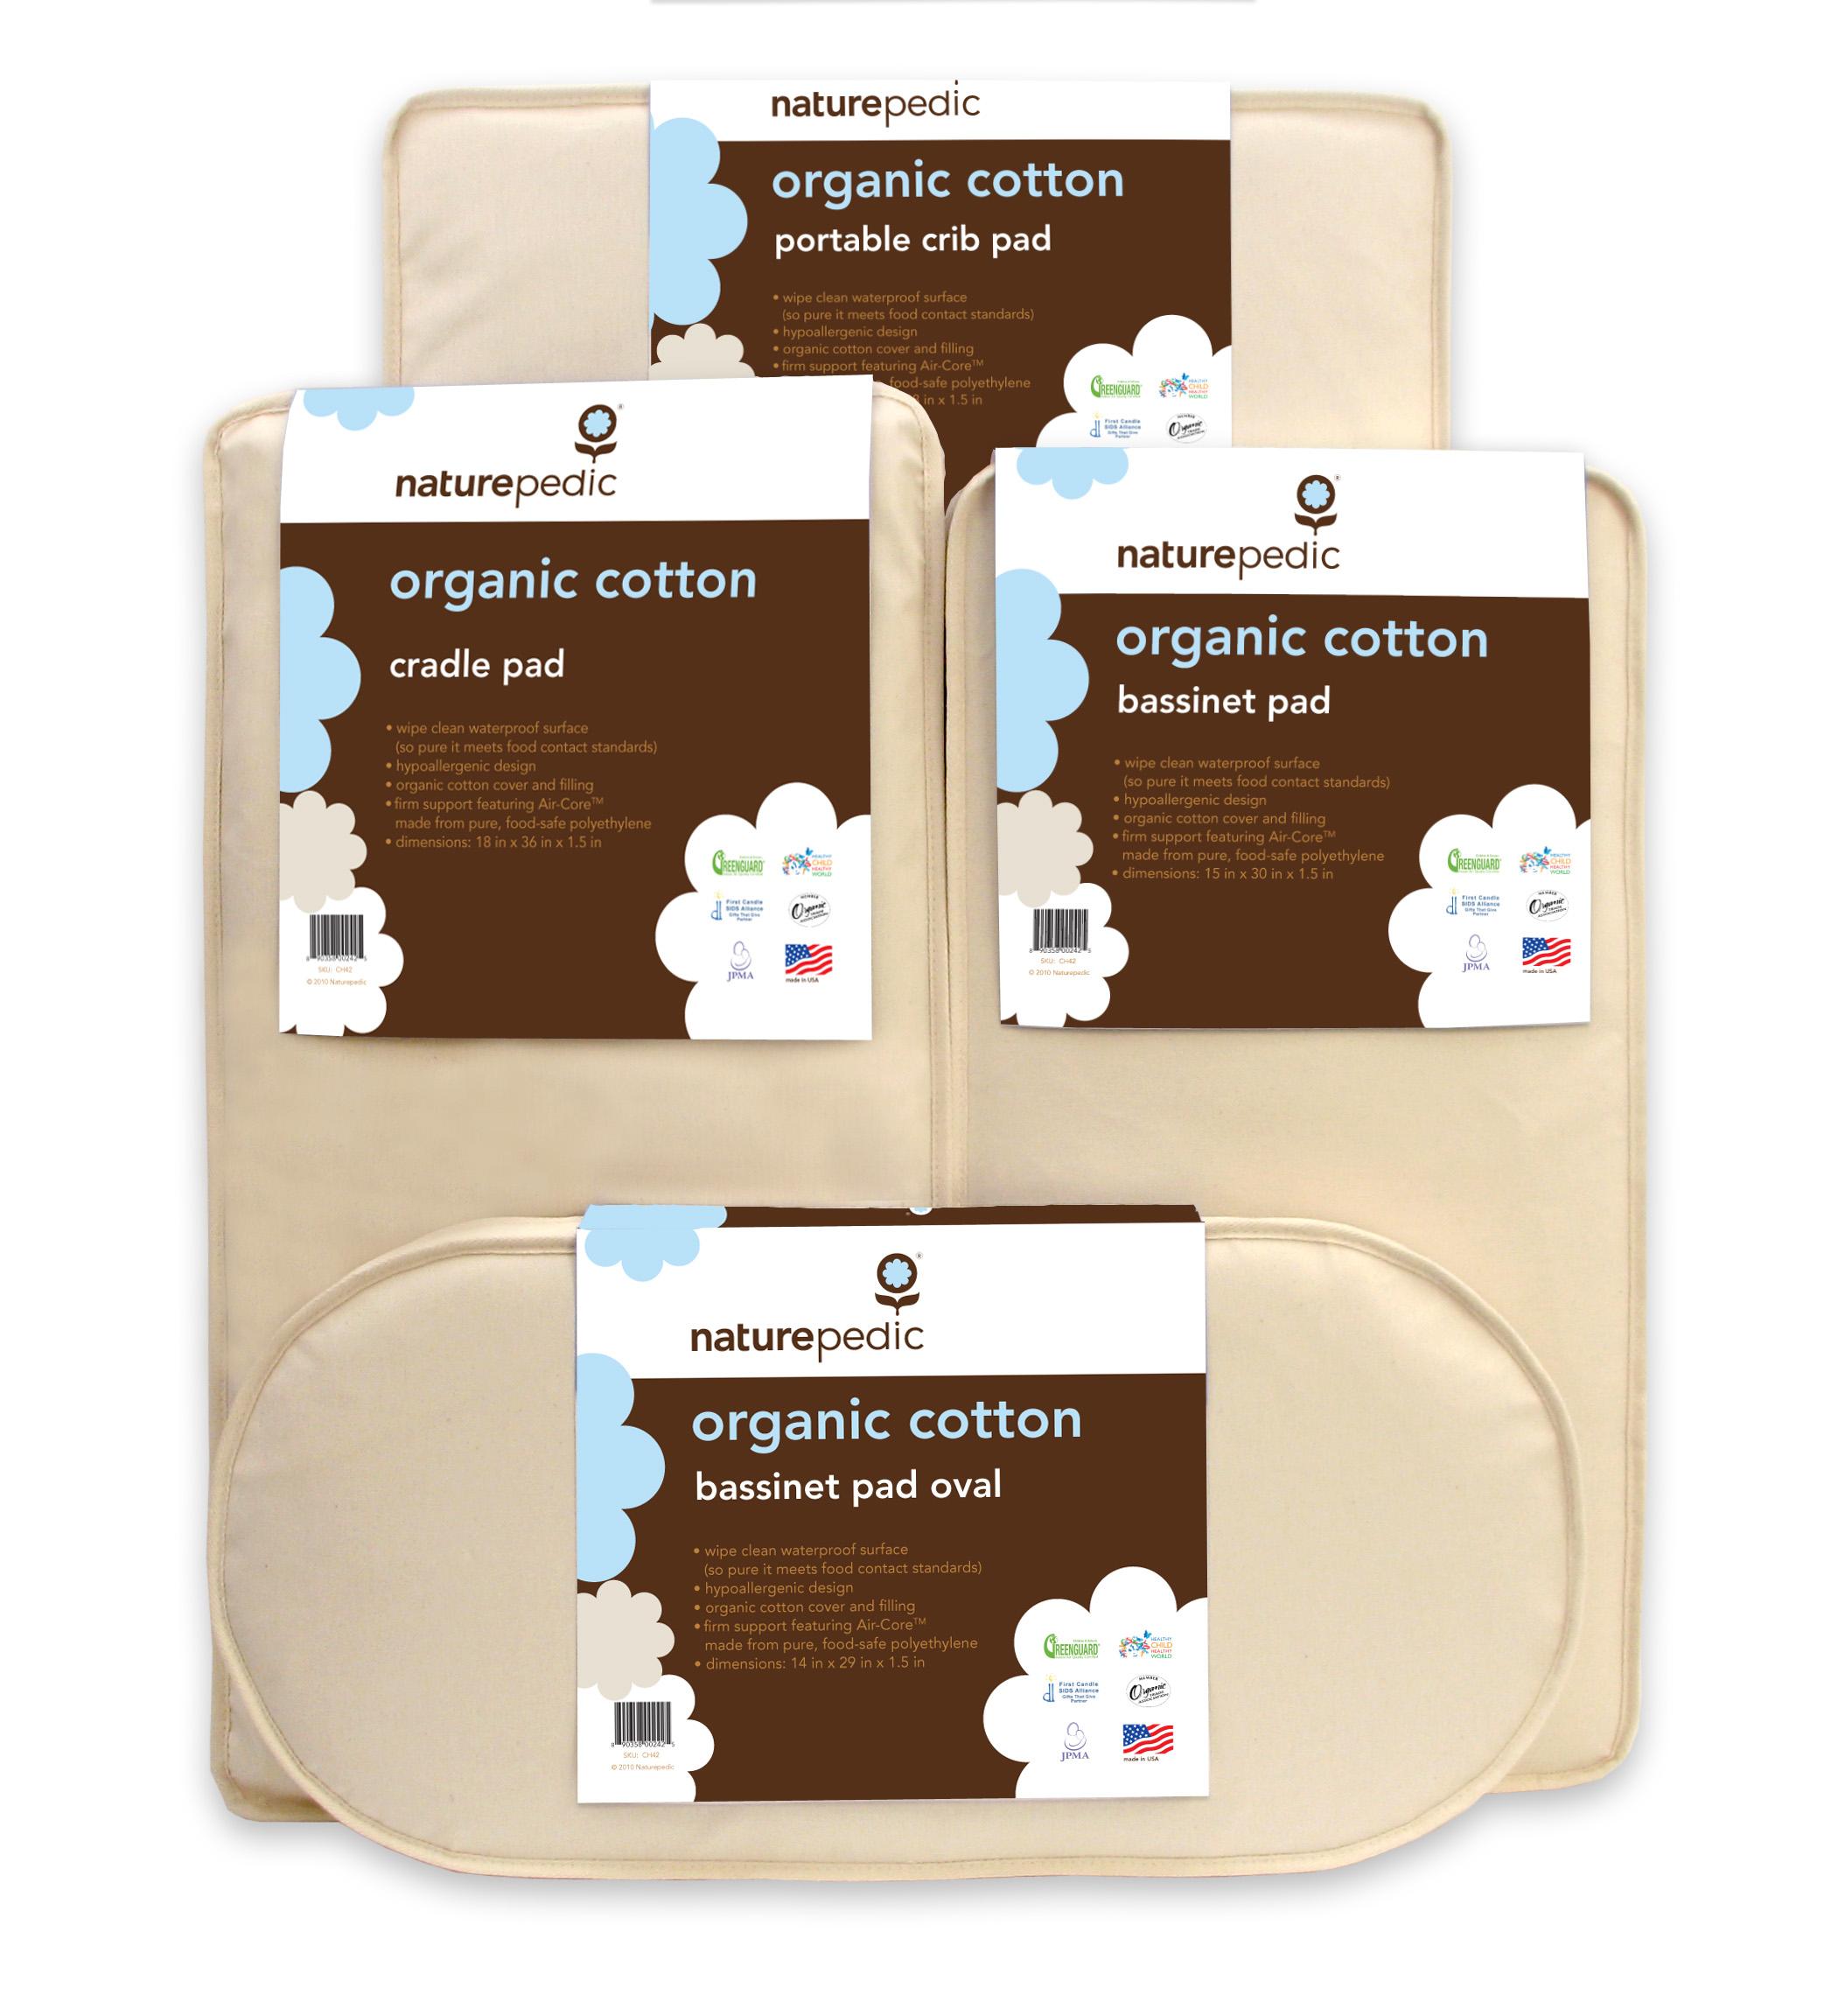 organic mattress company naturepedic wins organic trade asso